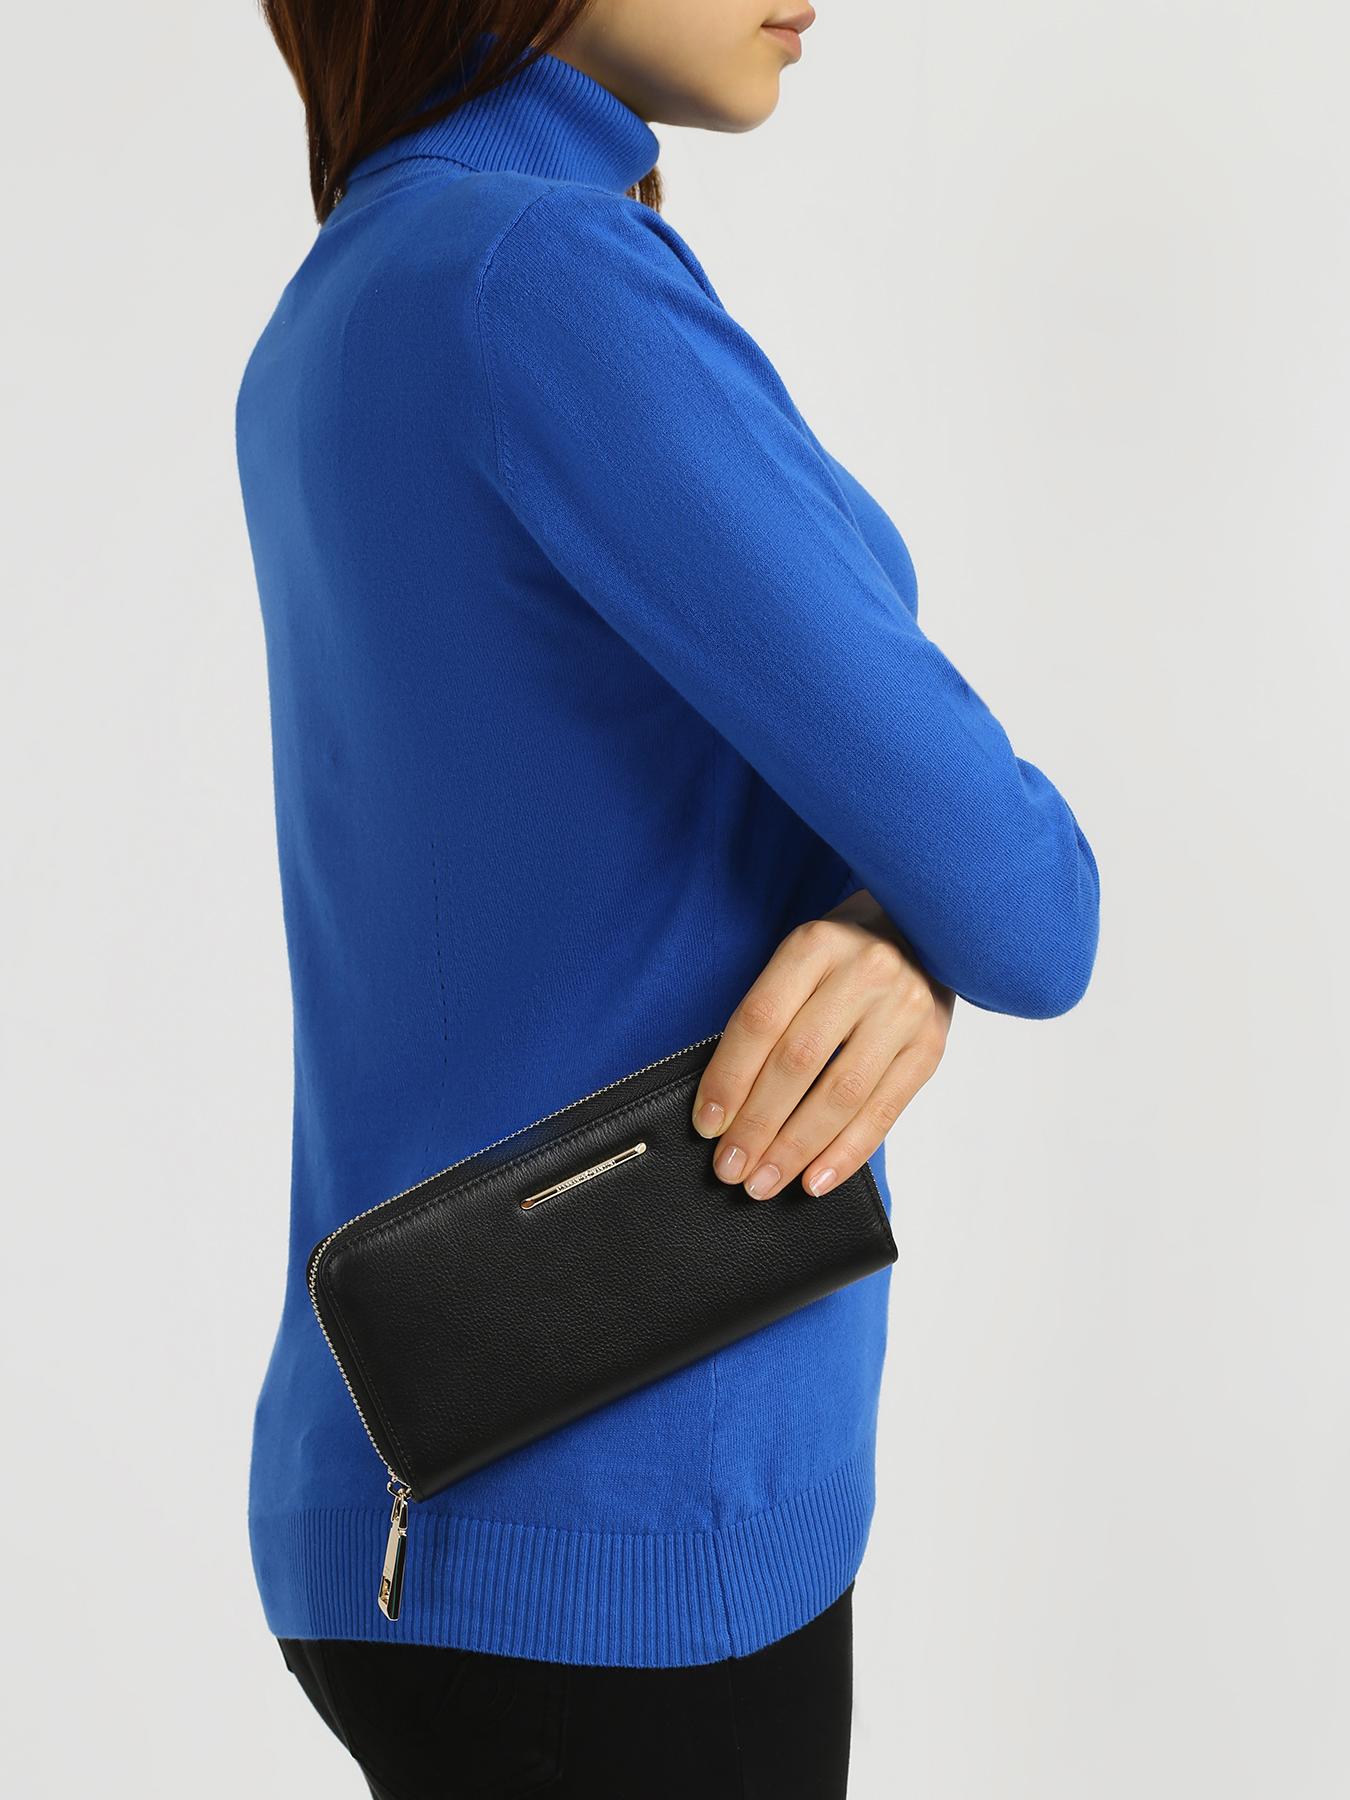 Кошелек Alessandro Manzoni Кожаный кошелек 1шт женщин дамы pu кожаный кошелек длинный кошелек держатель карты сумка clutch сумка